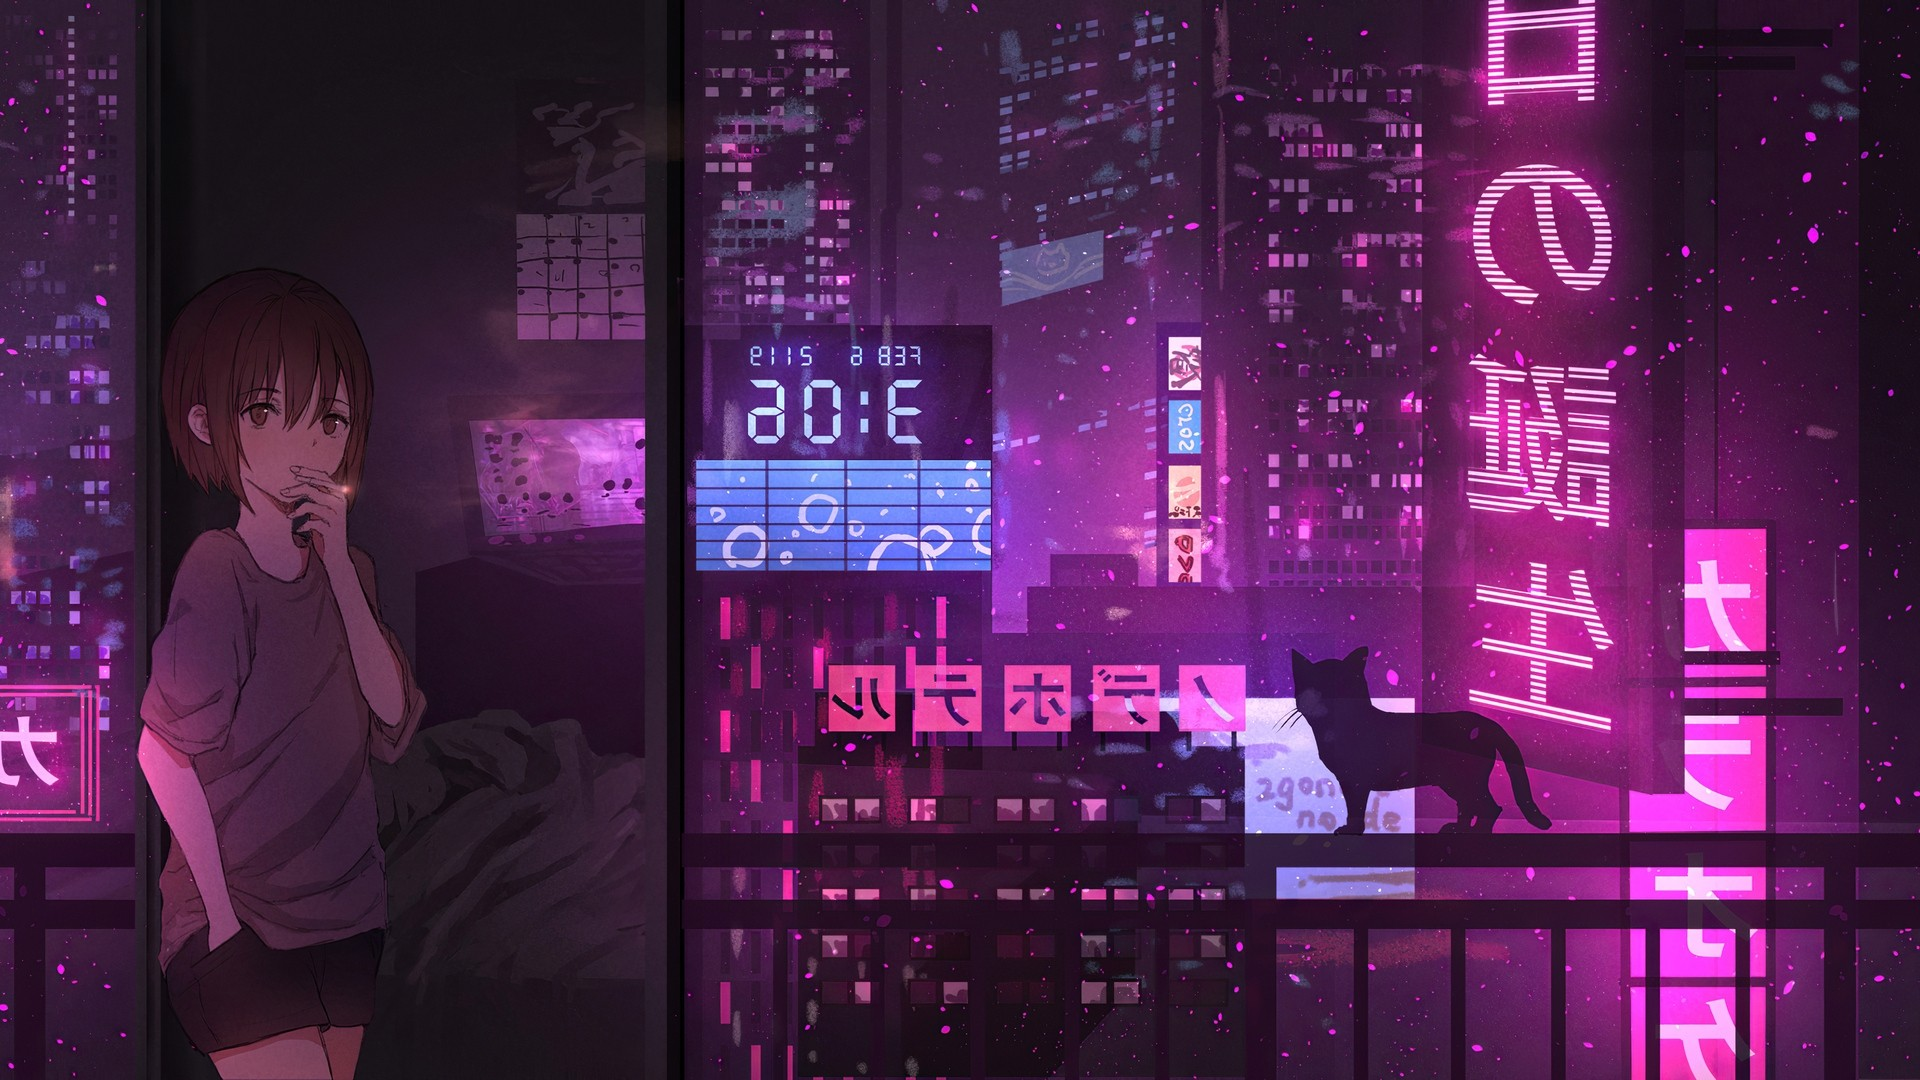 Anime Night Neon wallpaper for pc